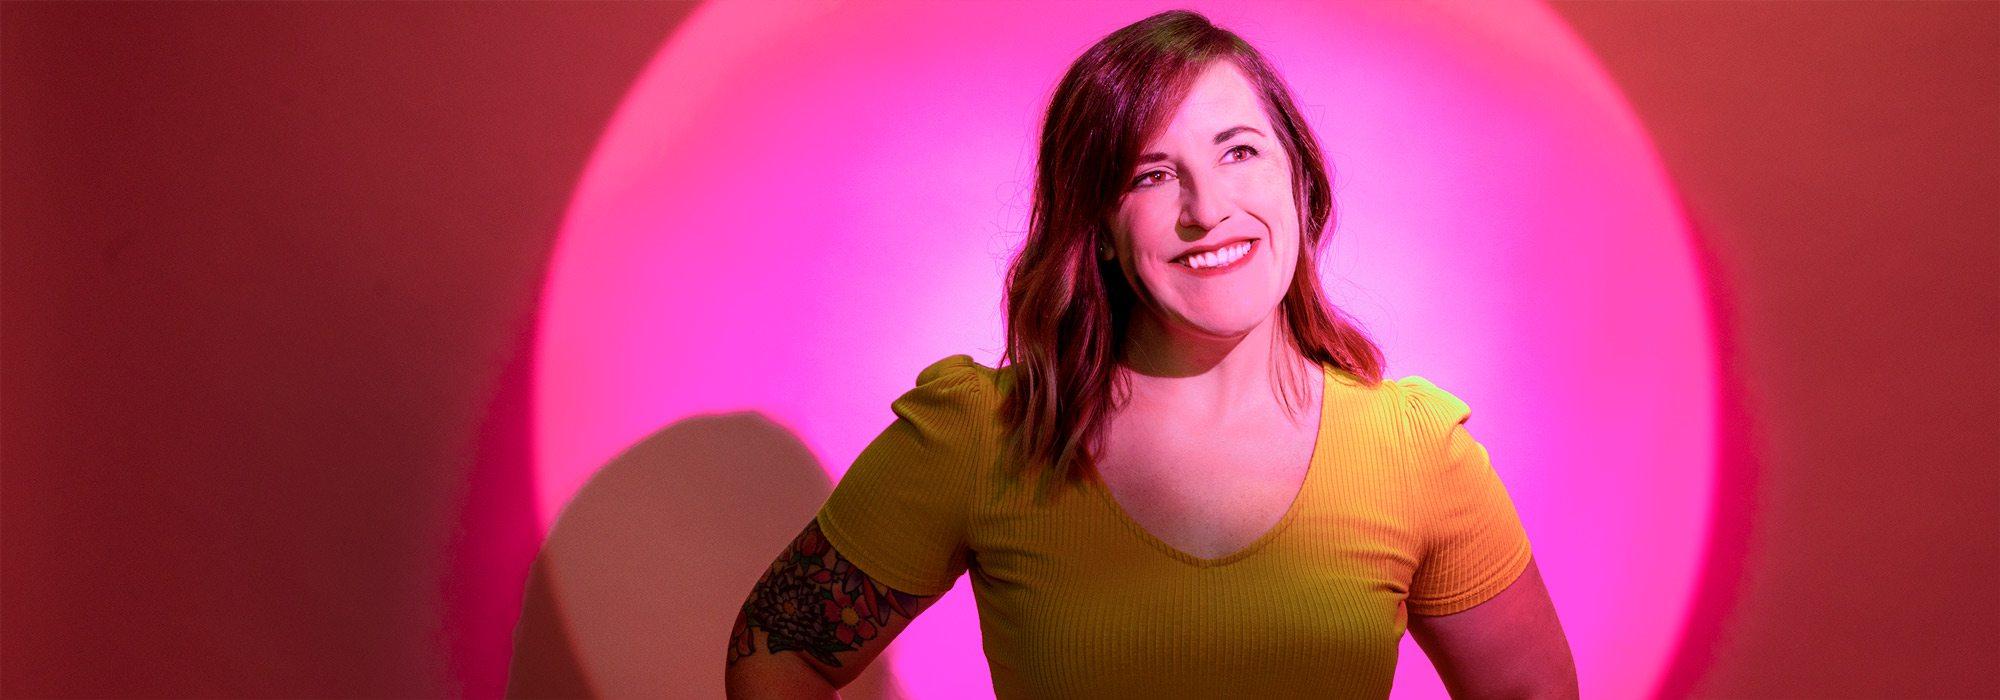 Meg Wagler, founder of MIDxMIDWST